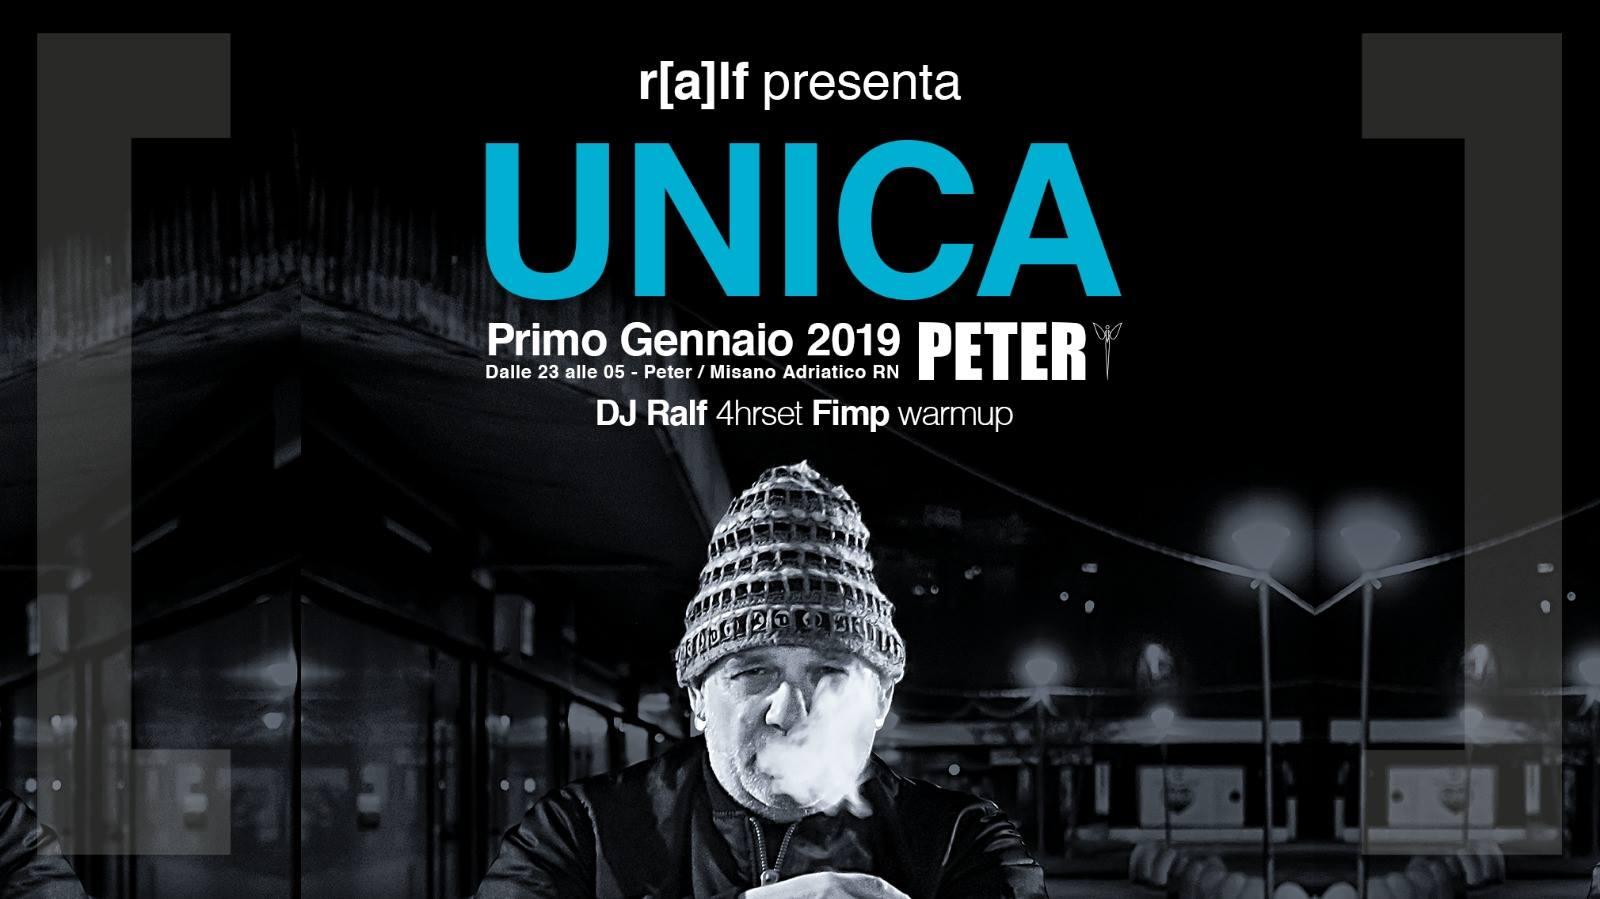 Peter Pan Riccione 01 Gennaio 2019